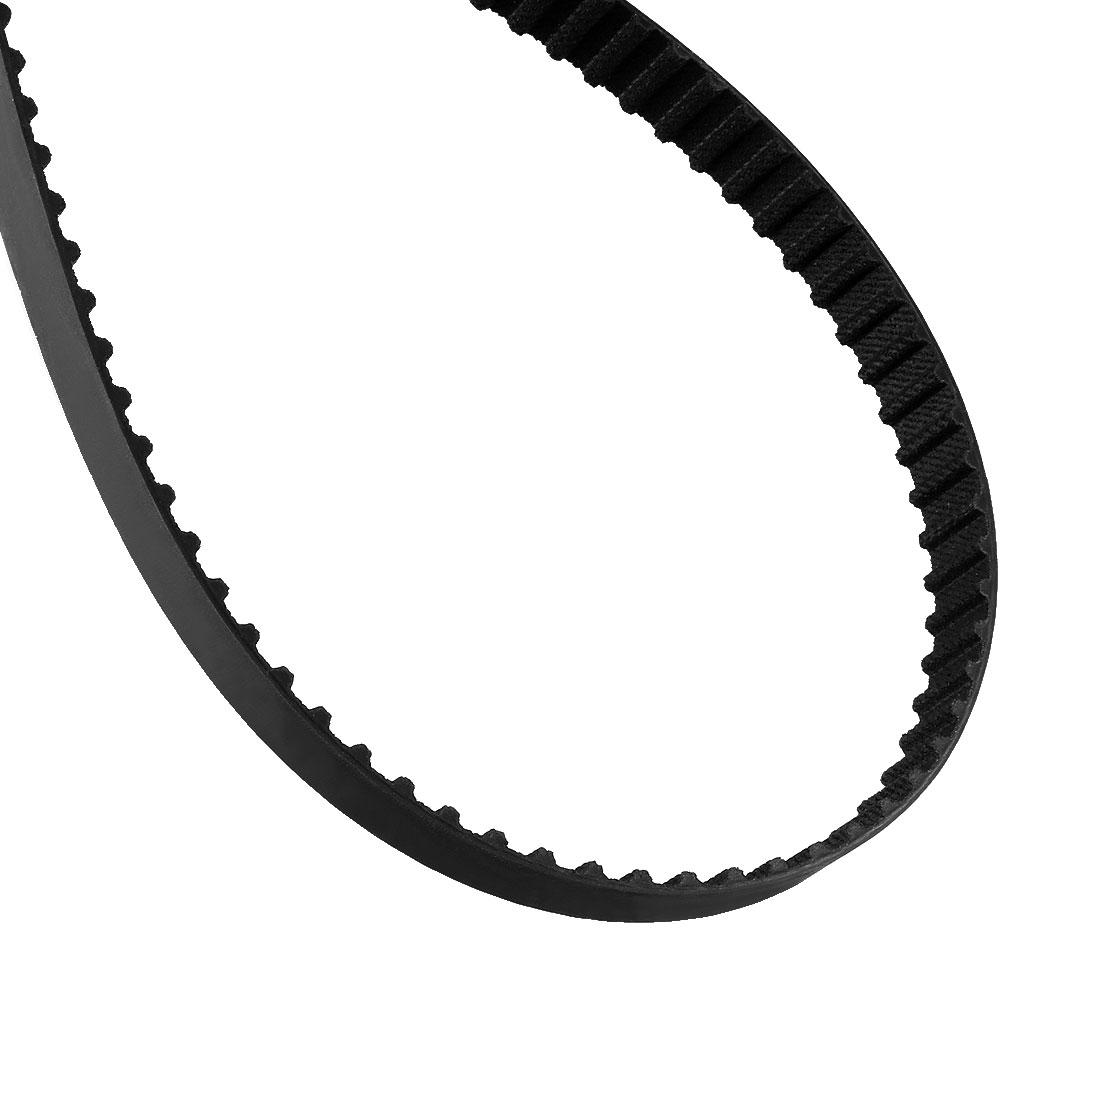 334XL 167 Teeth 10mm Width 5.08mm Pitch Stepper Motor Rubber Timing Belt Black